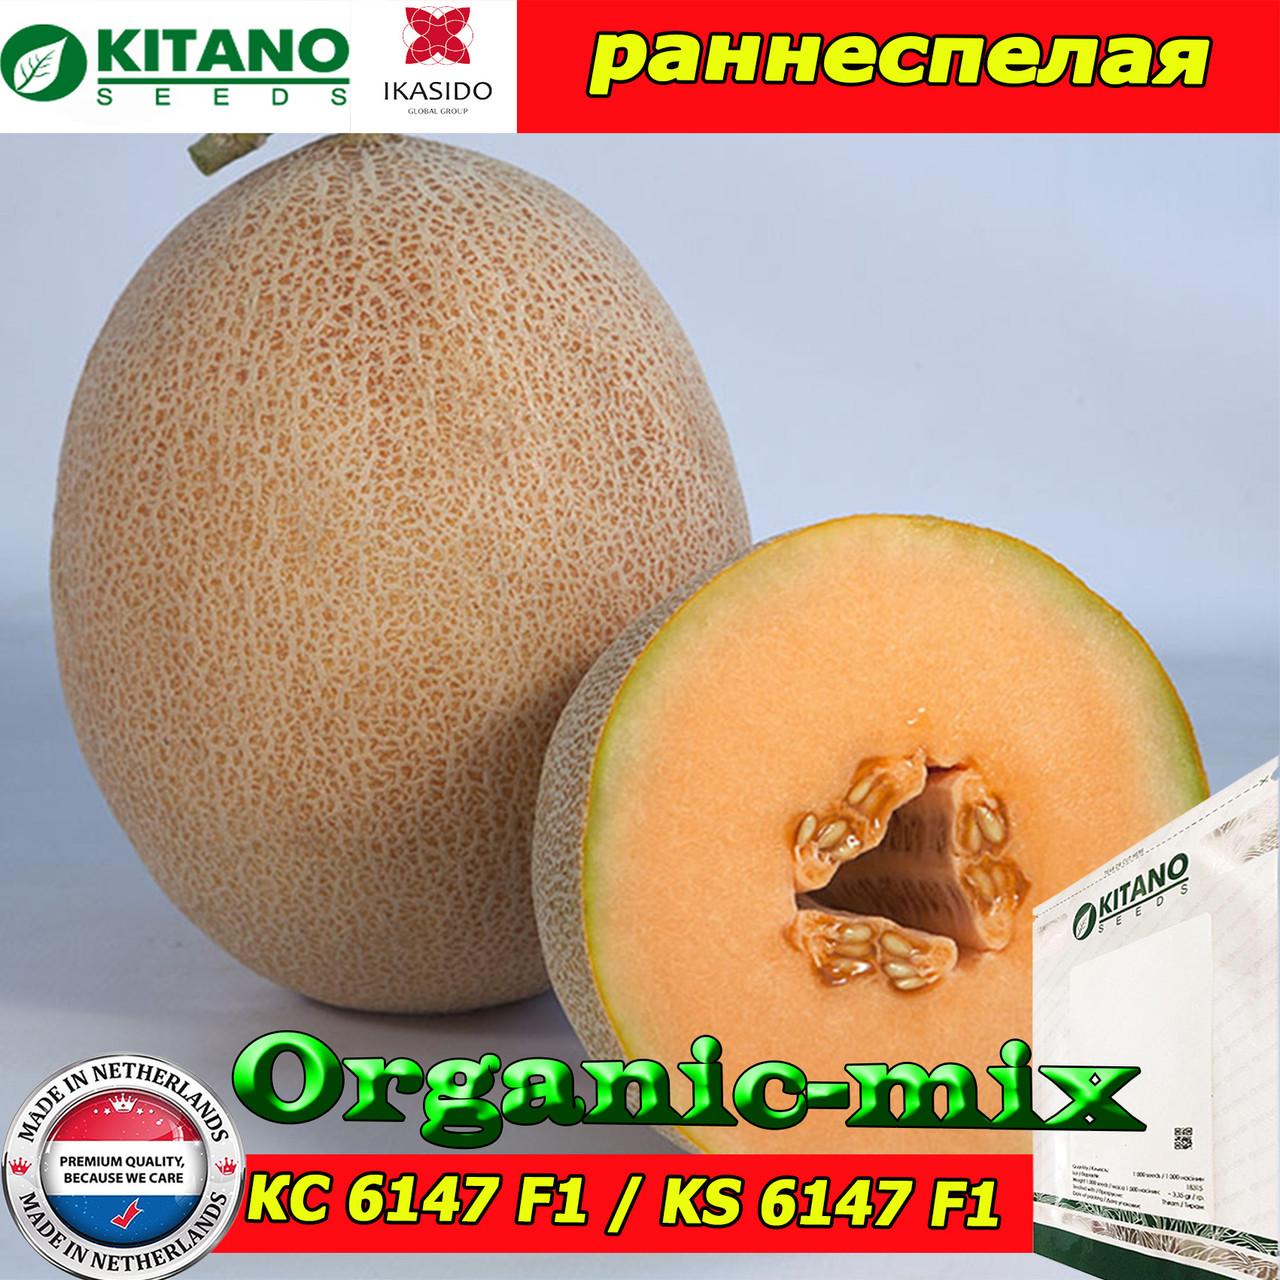 Семена, дыня КС 6147 F1 / KS 6147 F1 (ранеспелая), 1000 семян ТМ Kitano Seeds (Нидерланды)